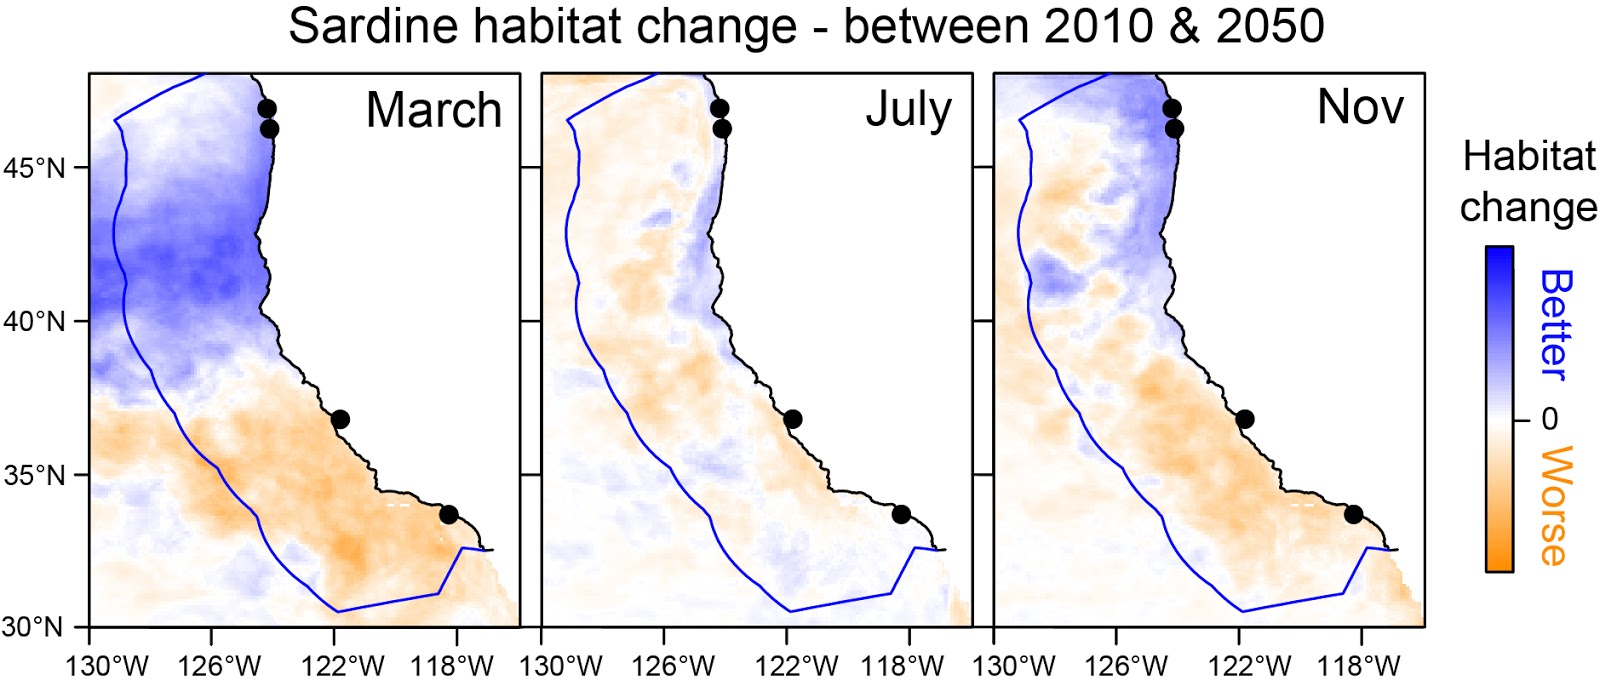 Heat maps showing predicted sardine habitat change